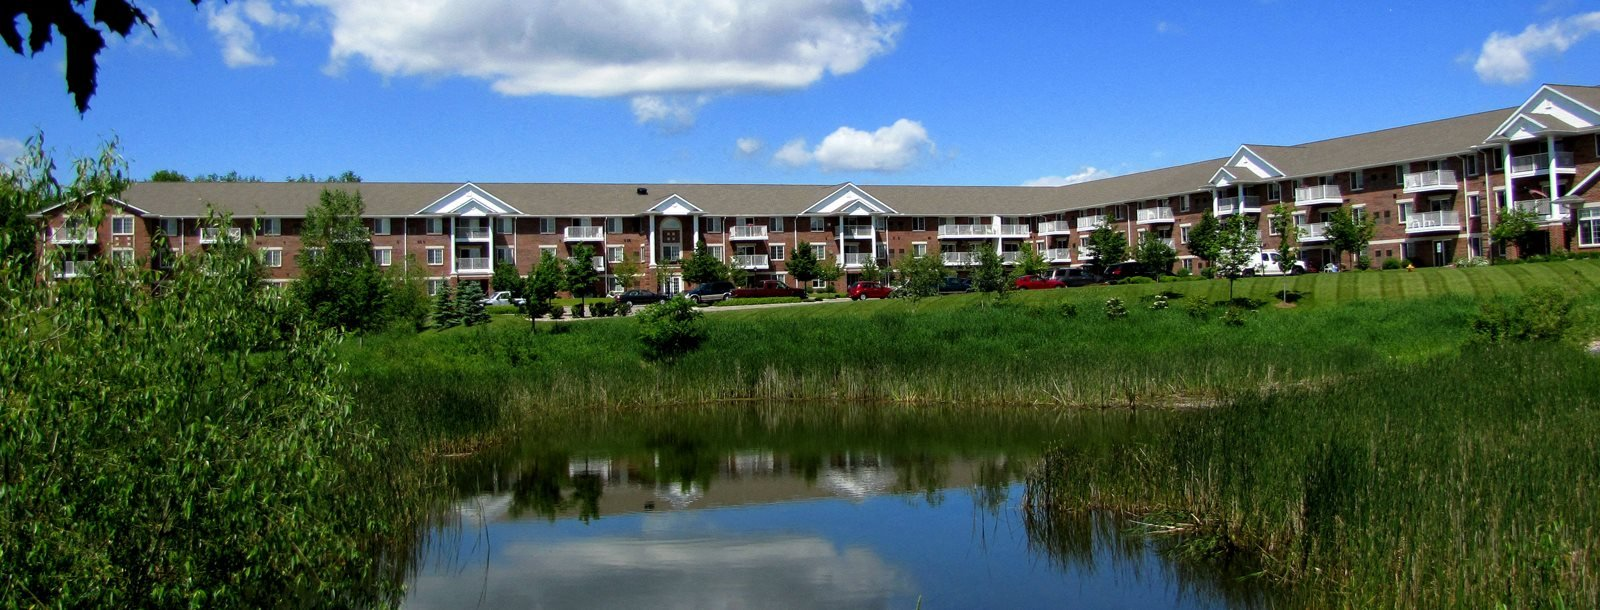 Beautiful Community Beside the Lake at Birchwood Highlands Apartments, 8005 Birch Street, 54476